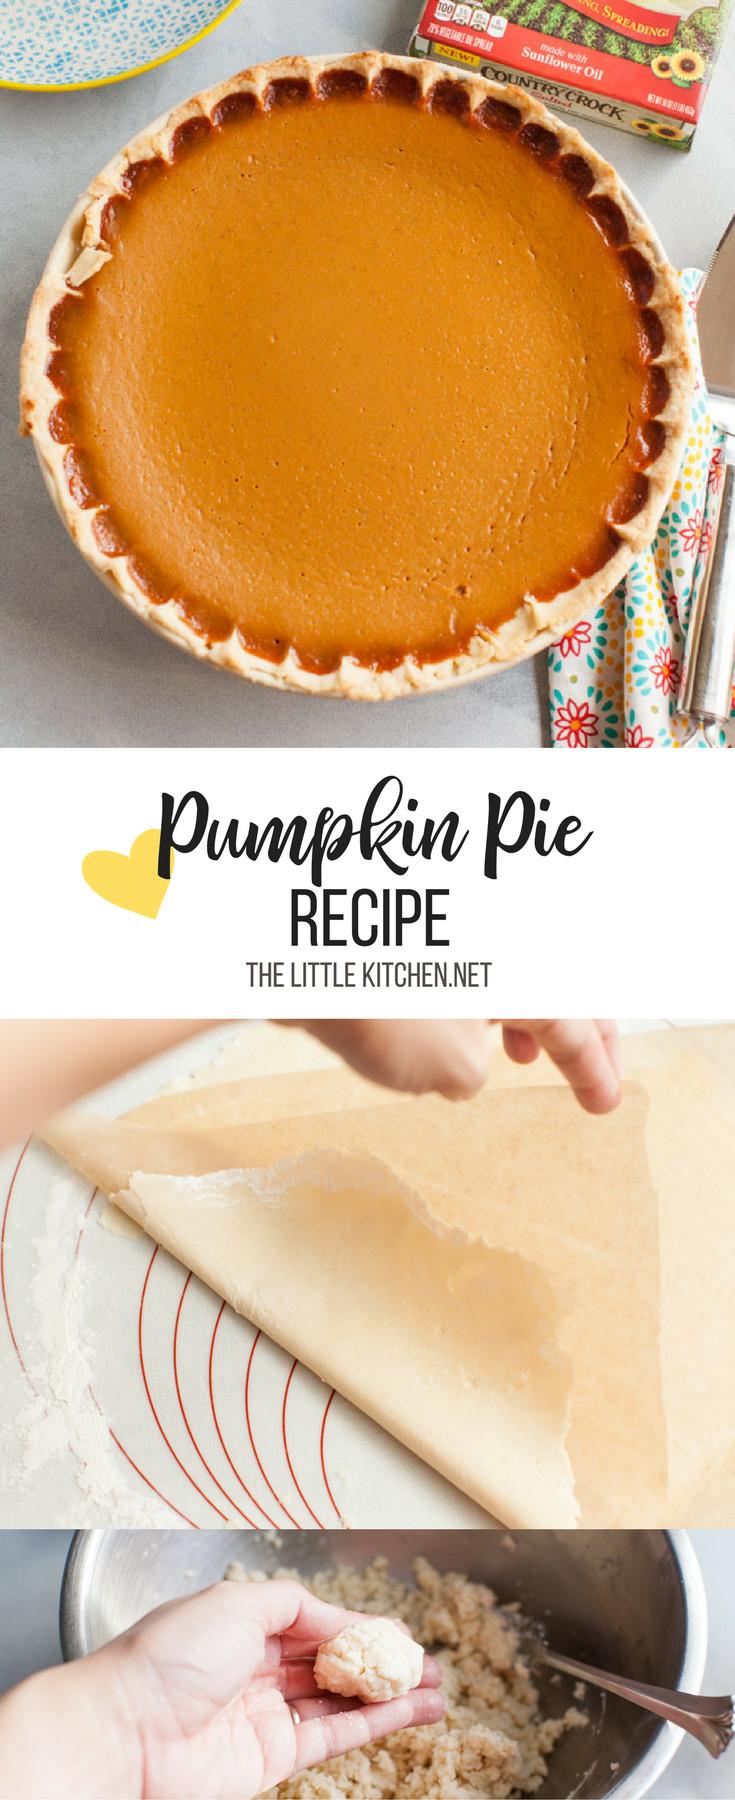 Easy Pumpkin Pie Recipe  Easy Pumpkin Pie Recipe The Little Kitchen